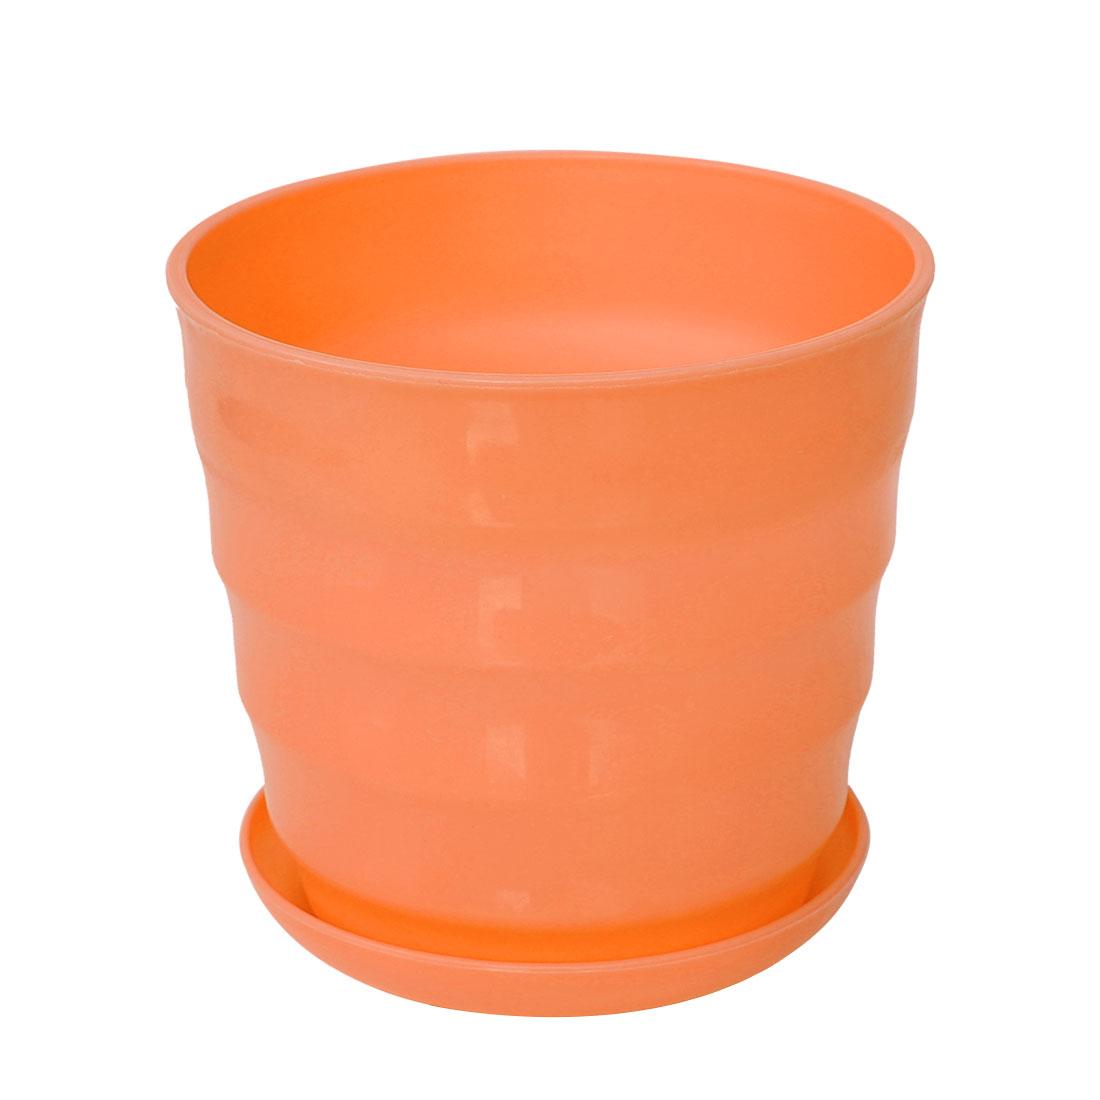 Home Office Desk Plastic Round Plant Planter Holder Flower Pot Orange 13cm Dia